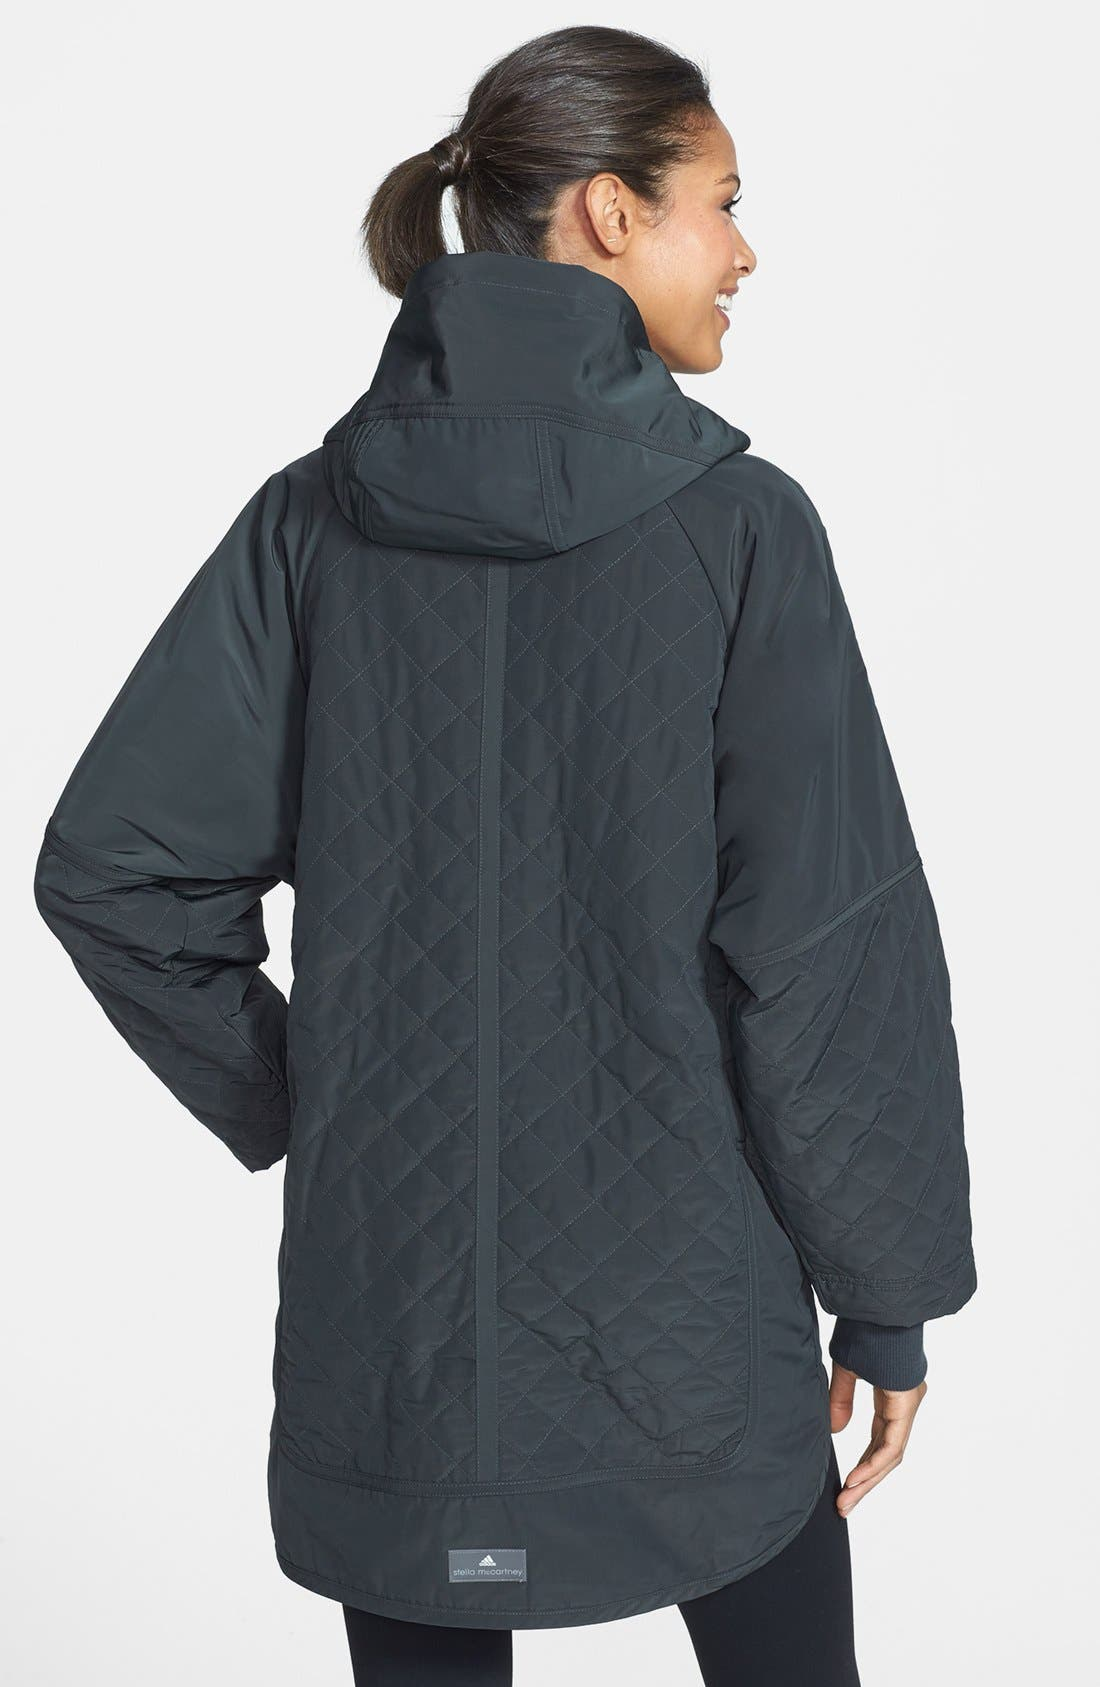 Alternate Image 2  - adidas by Stella McCartney 'Wintersport' Hooded Jacket